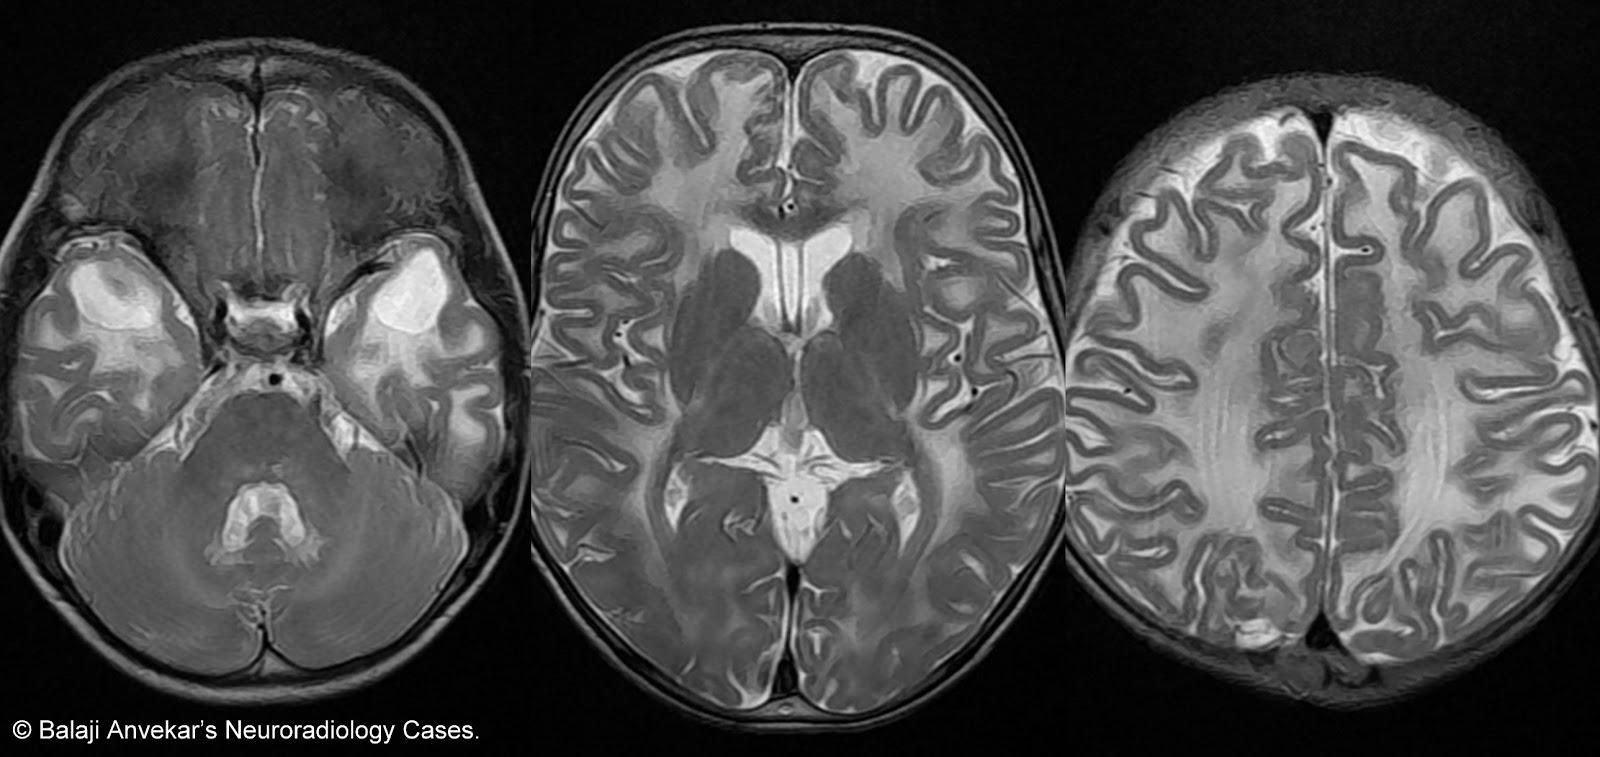 Neuroradiology cases van der knaap leukoencephalopathy mri